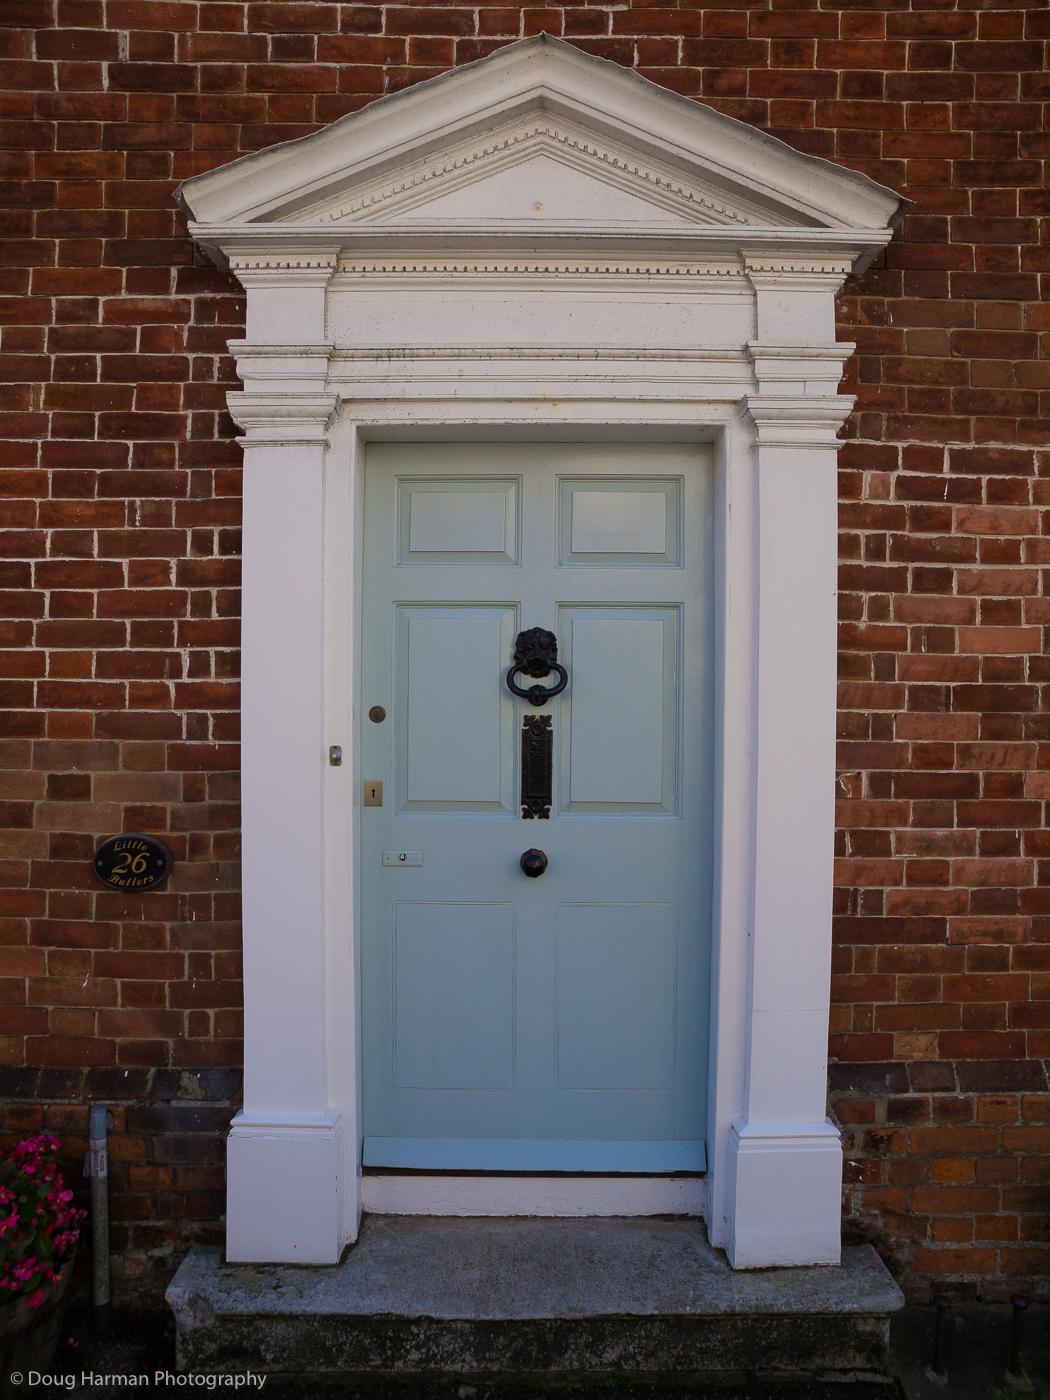 A blue door photo that forms part of my Doorways project.